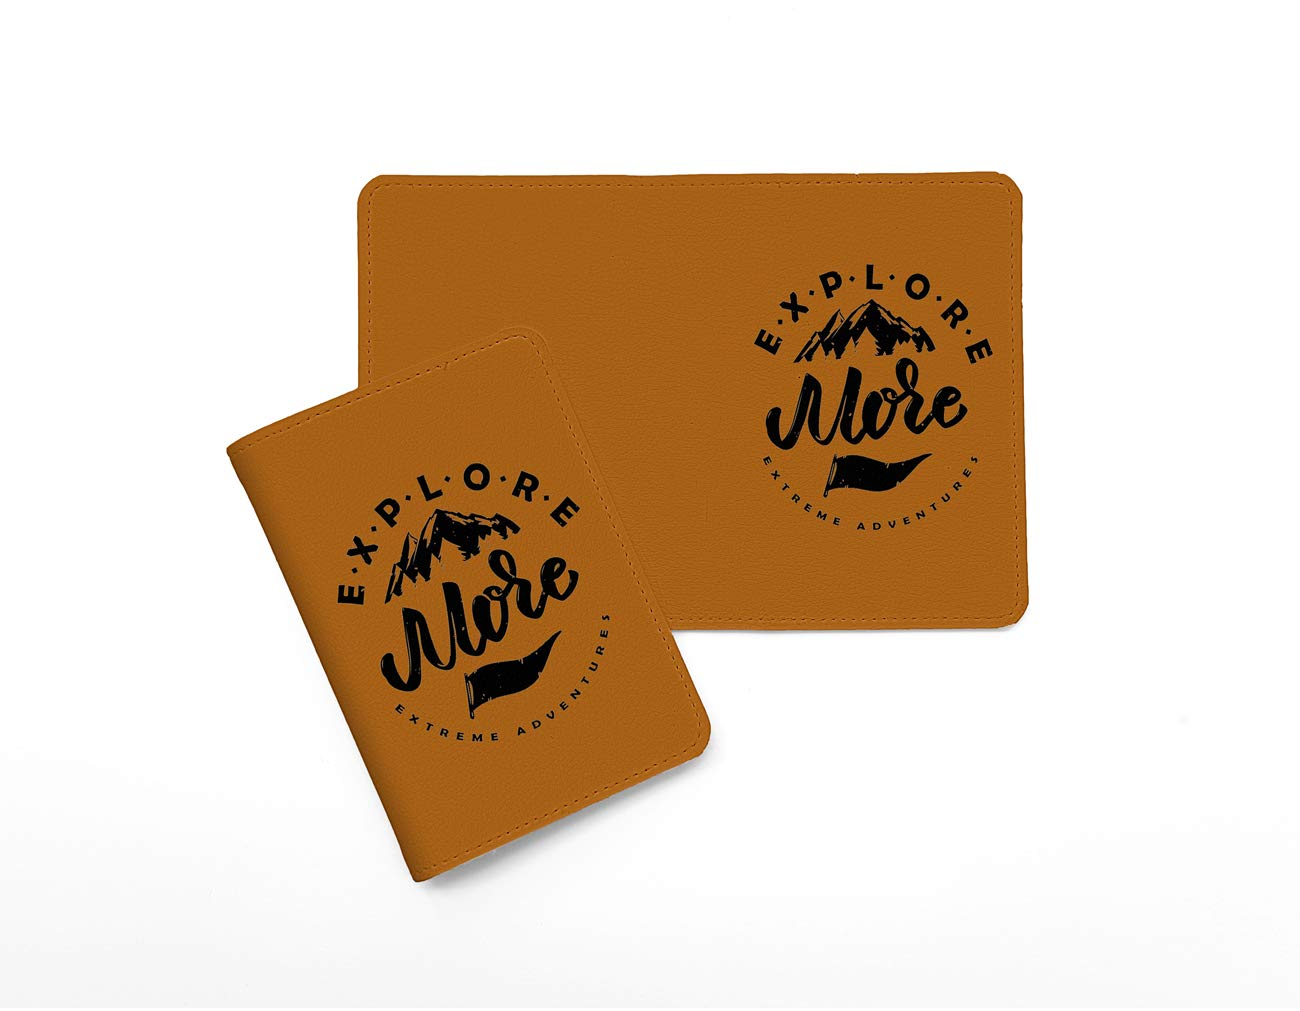 Explore More Customized Cute Leather Passport Holder Passport Wallet/_SUPERTRAMPshop Passport Covers